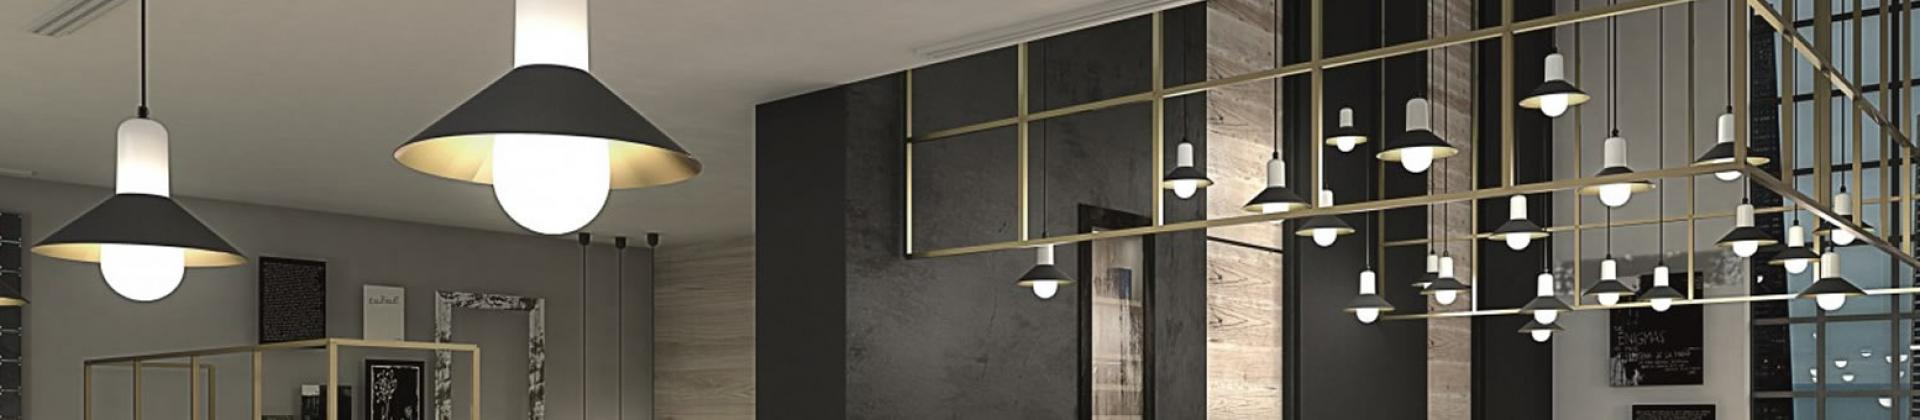 Marc Milan Iluminacion - Lámparas de diseño